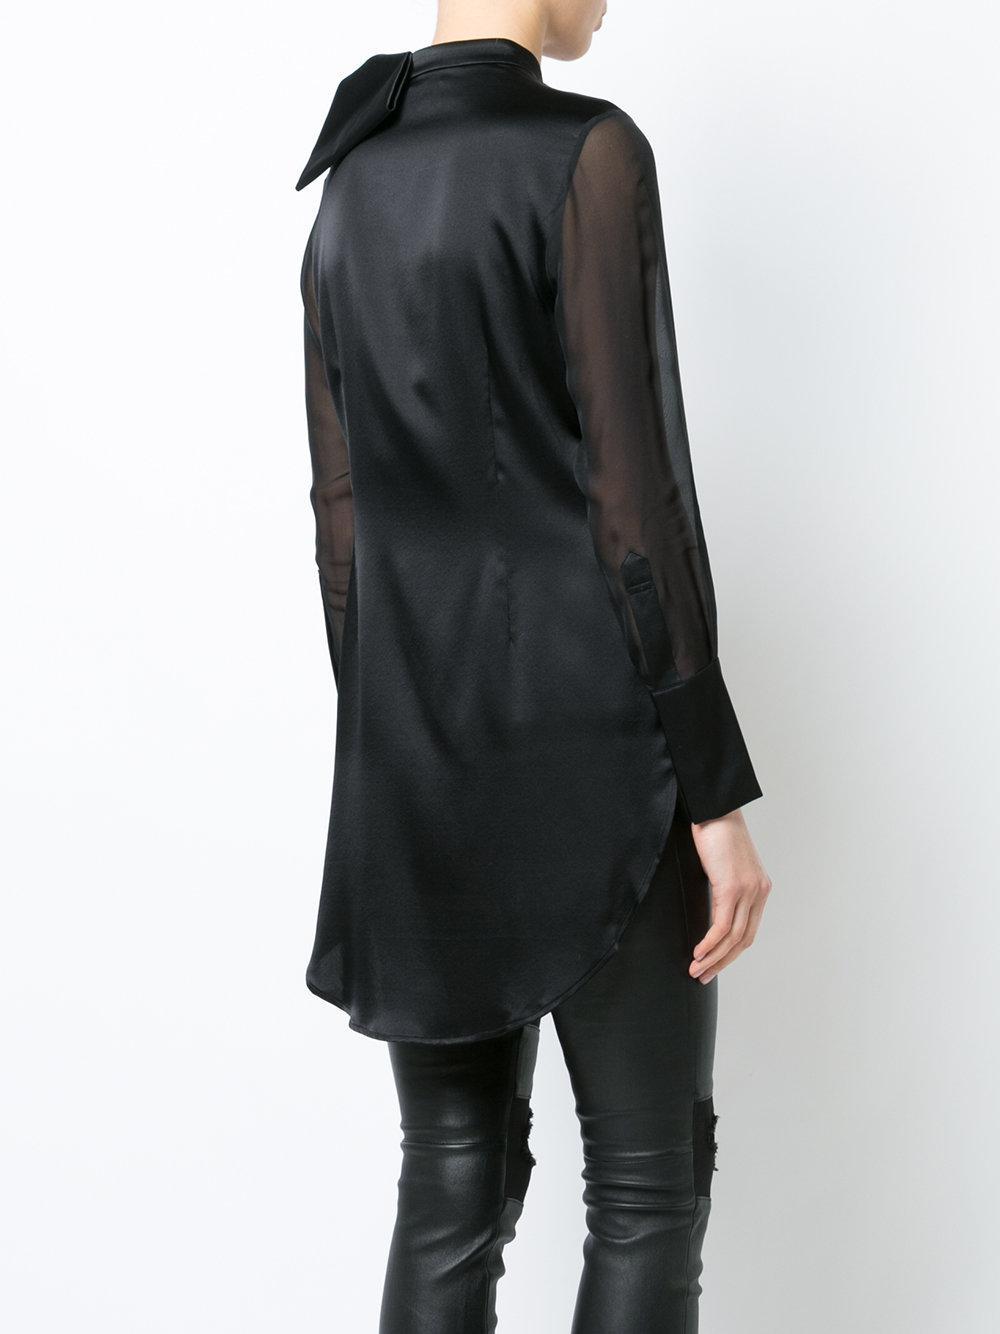 Thomas Wylde Lyst de adornada negro Camisa con lazo pqzS8wF